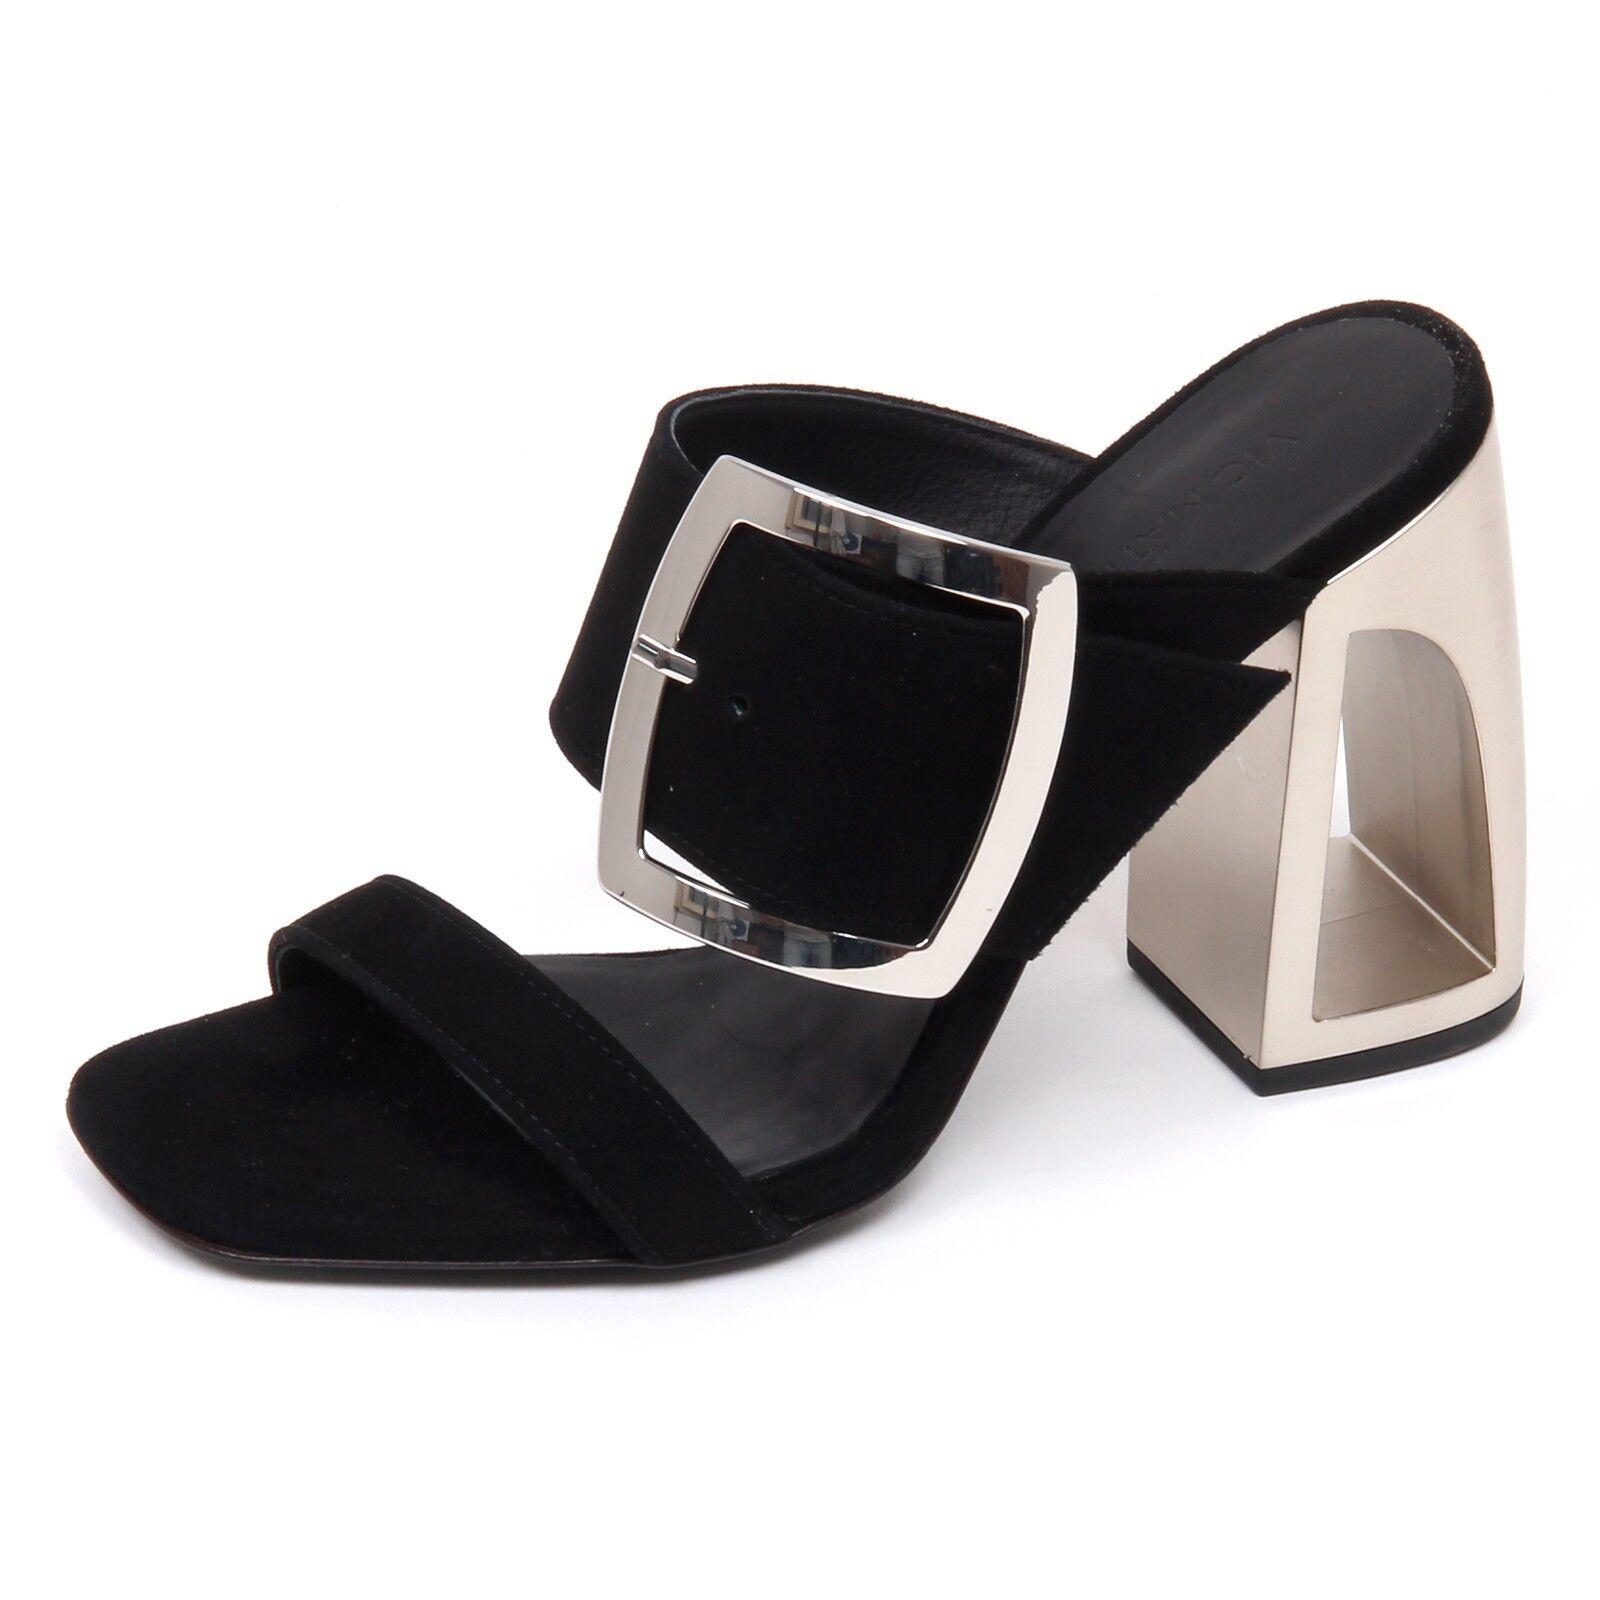 E9530 Sandalo Sandalo Sandalo mujer Negro Vic Matie LongIsland zapatos Gamuza Sandalia Zapato Mujer  suministramos lo mejor